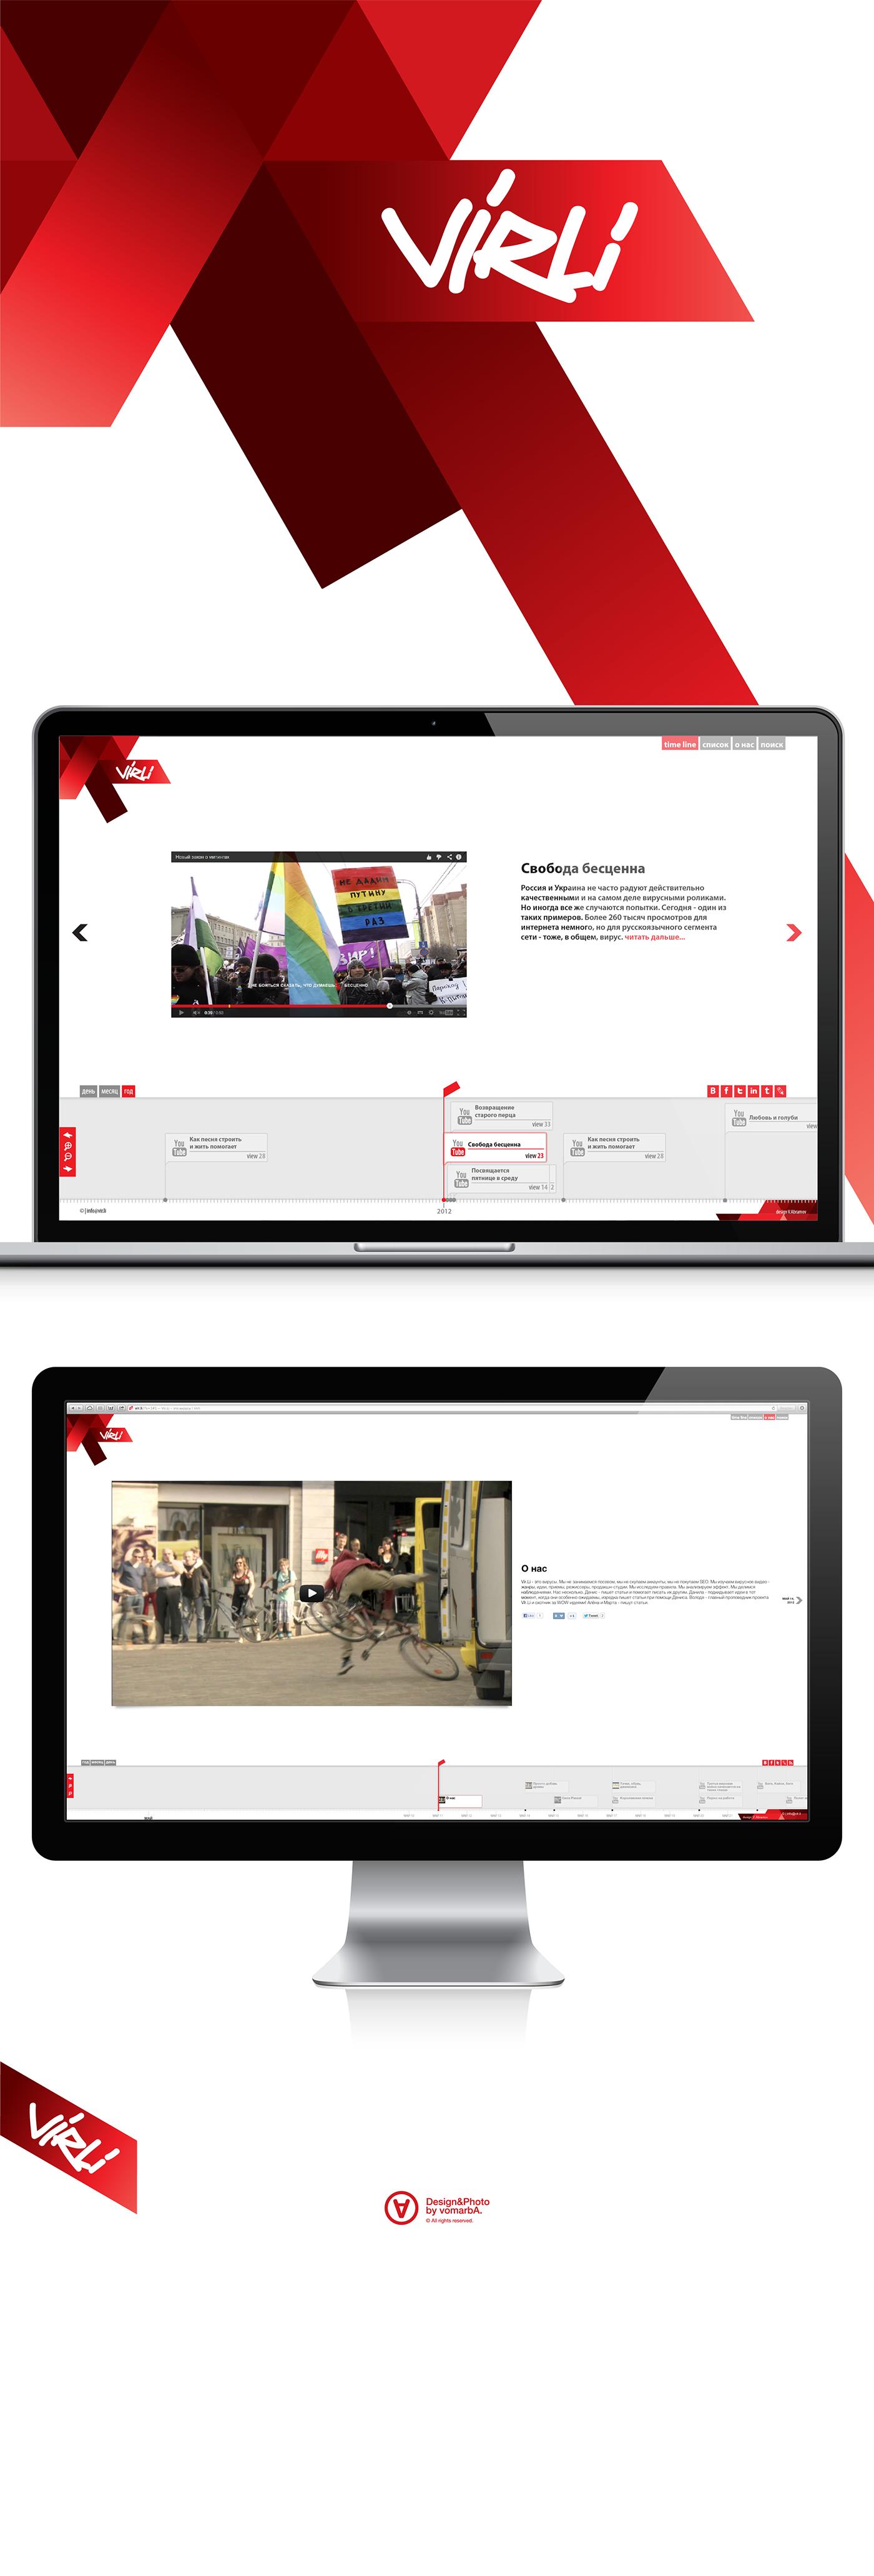 Vir.li_library of viral video / web / logo